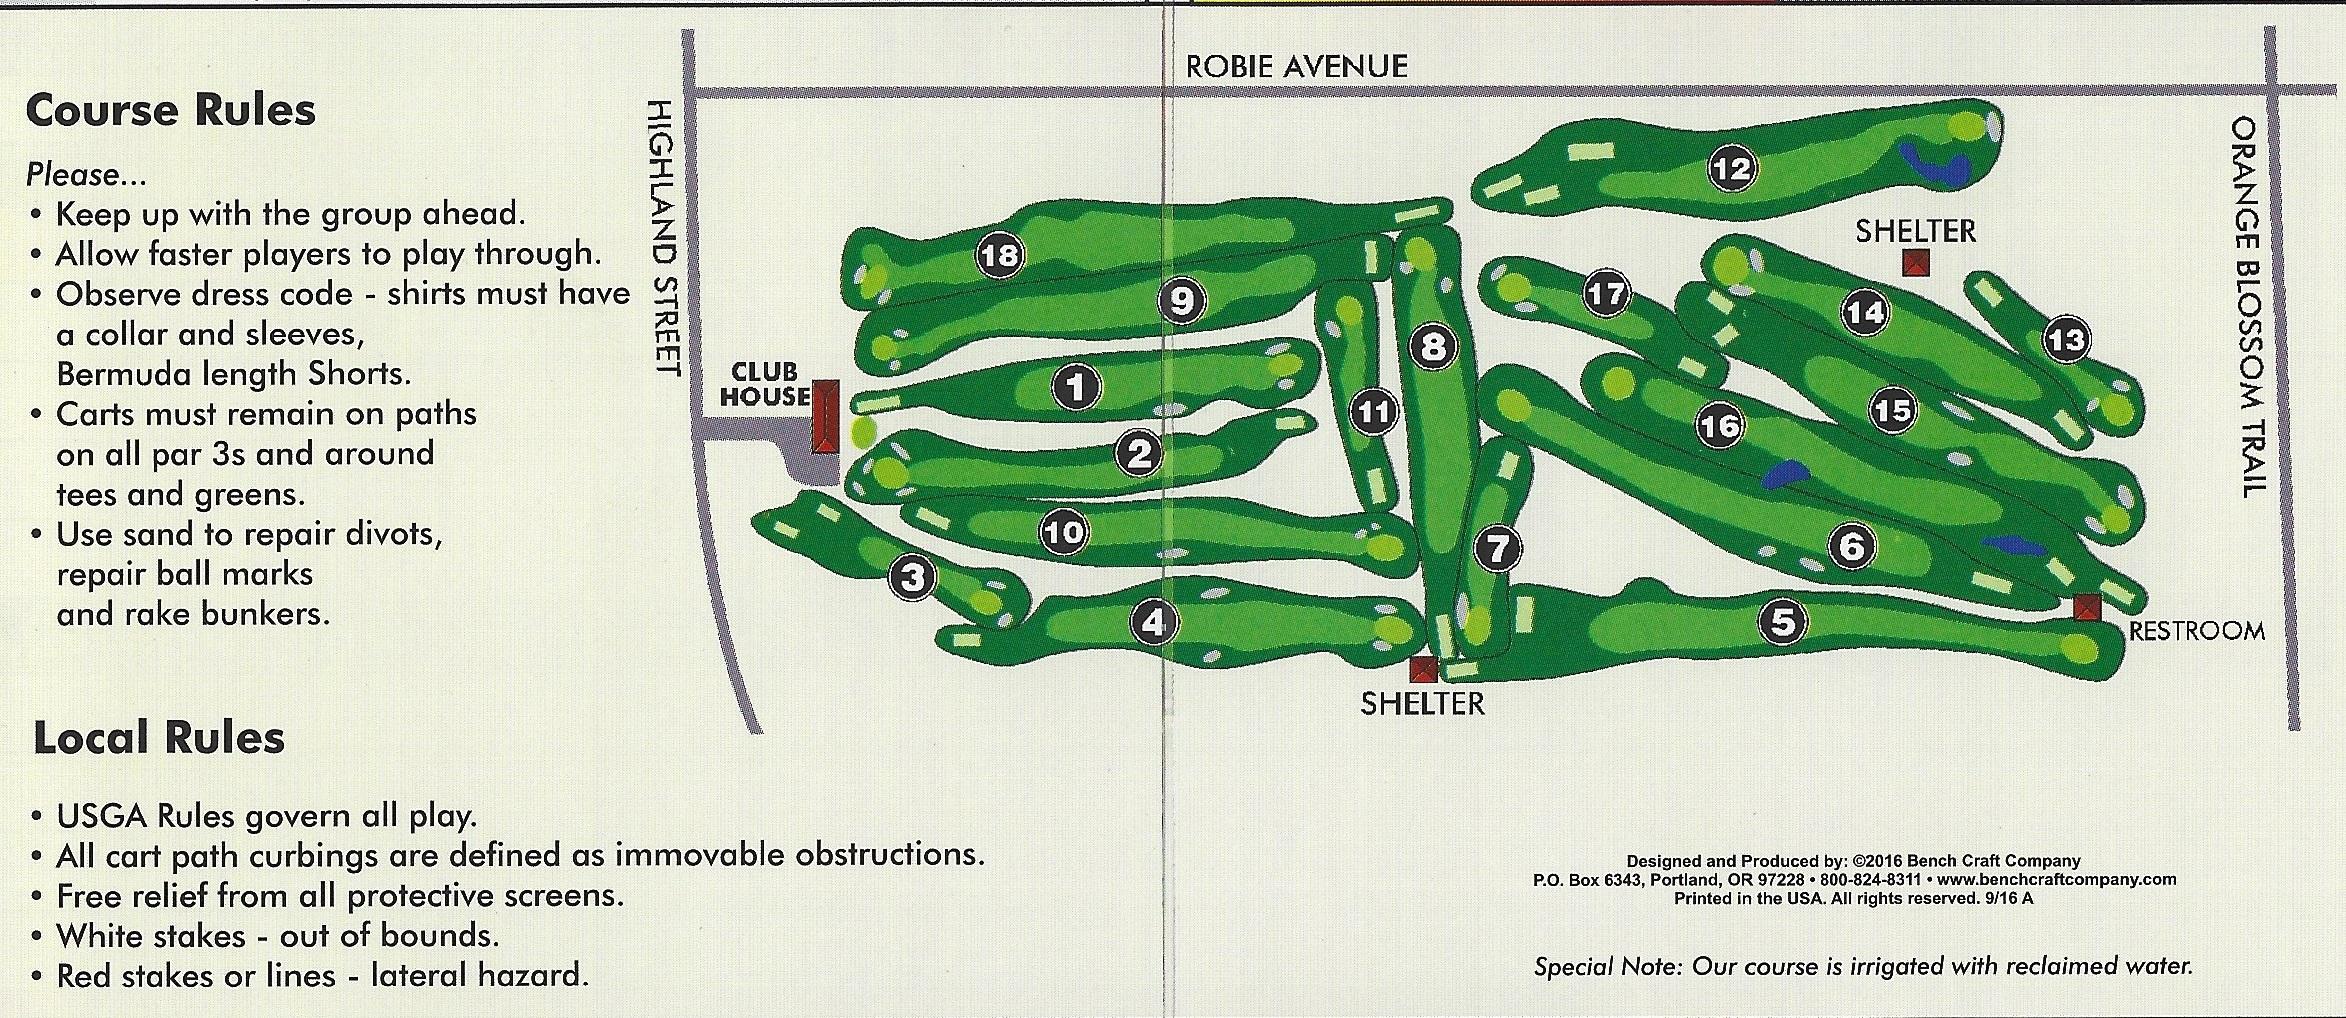 Scorecard With Map